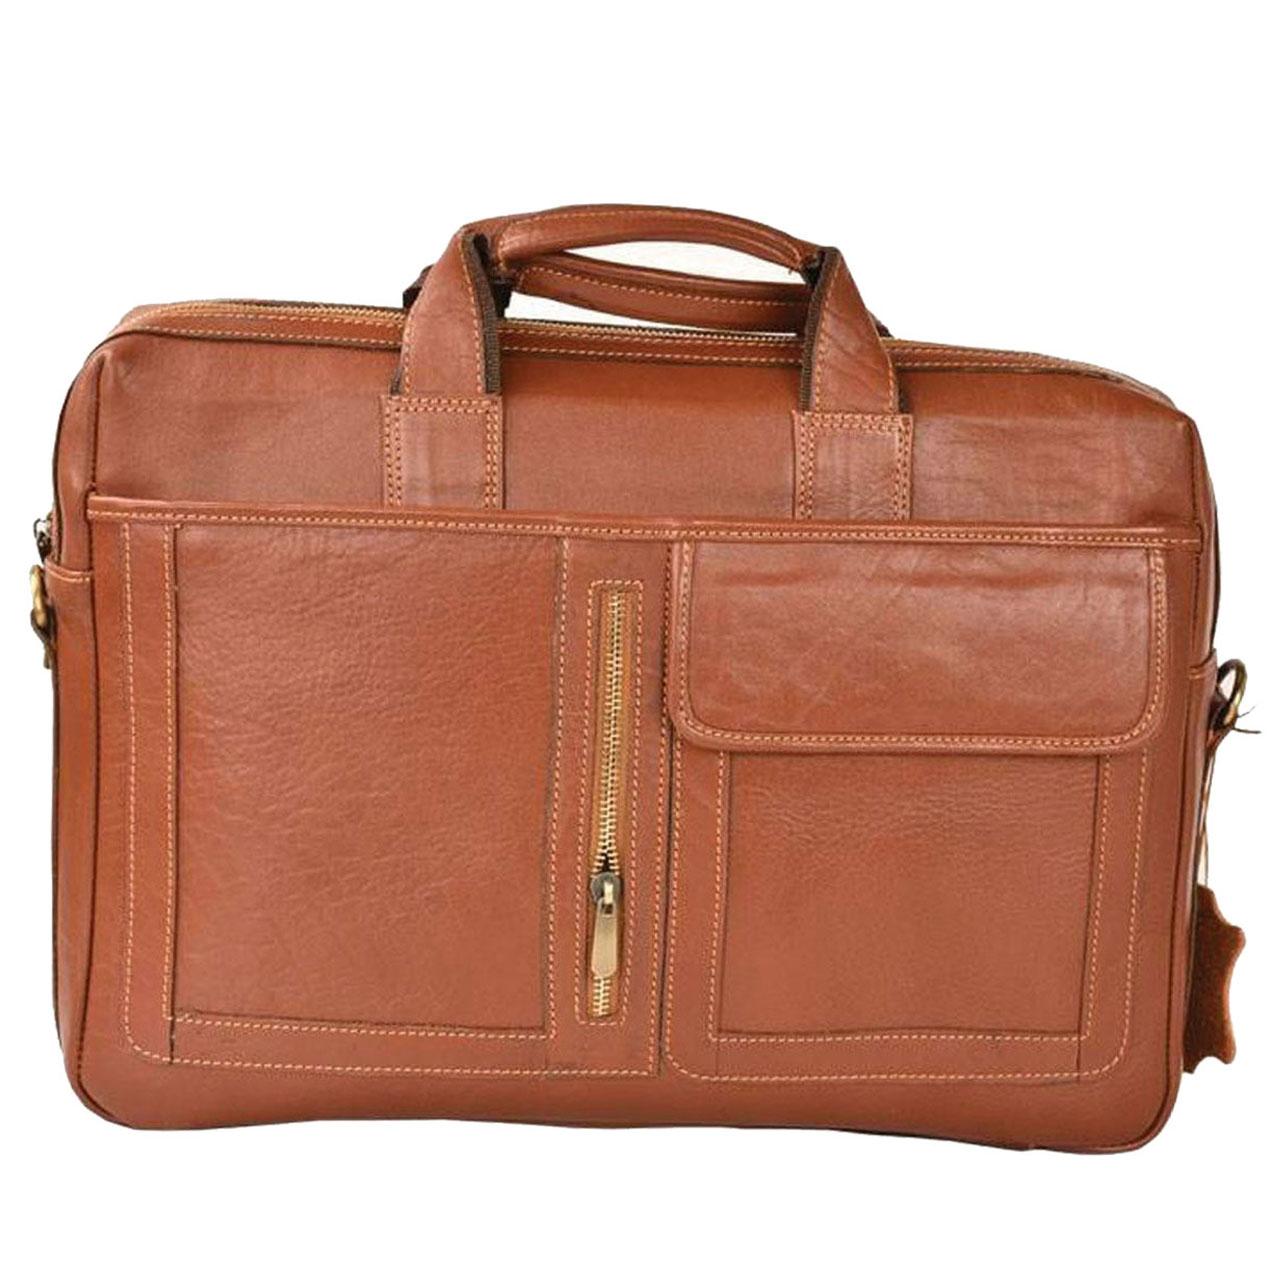 کیف اداری مردانه پارینه چرم مدل L67